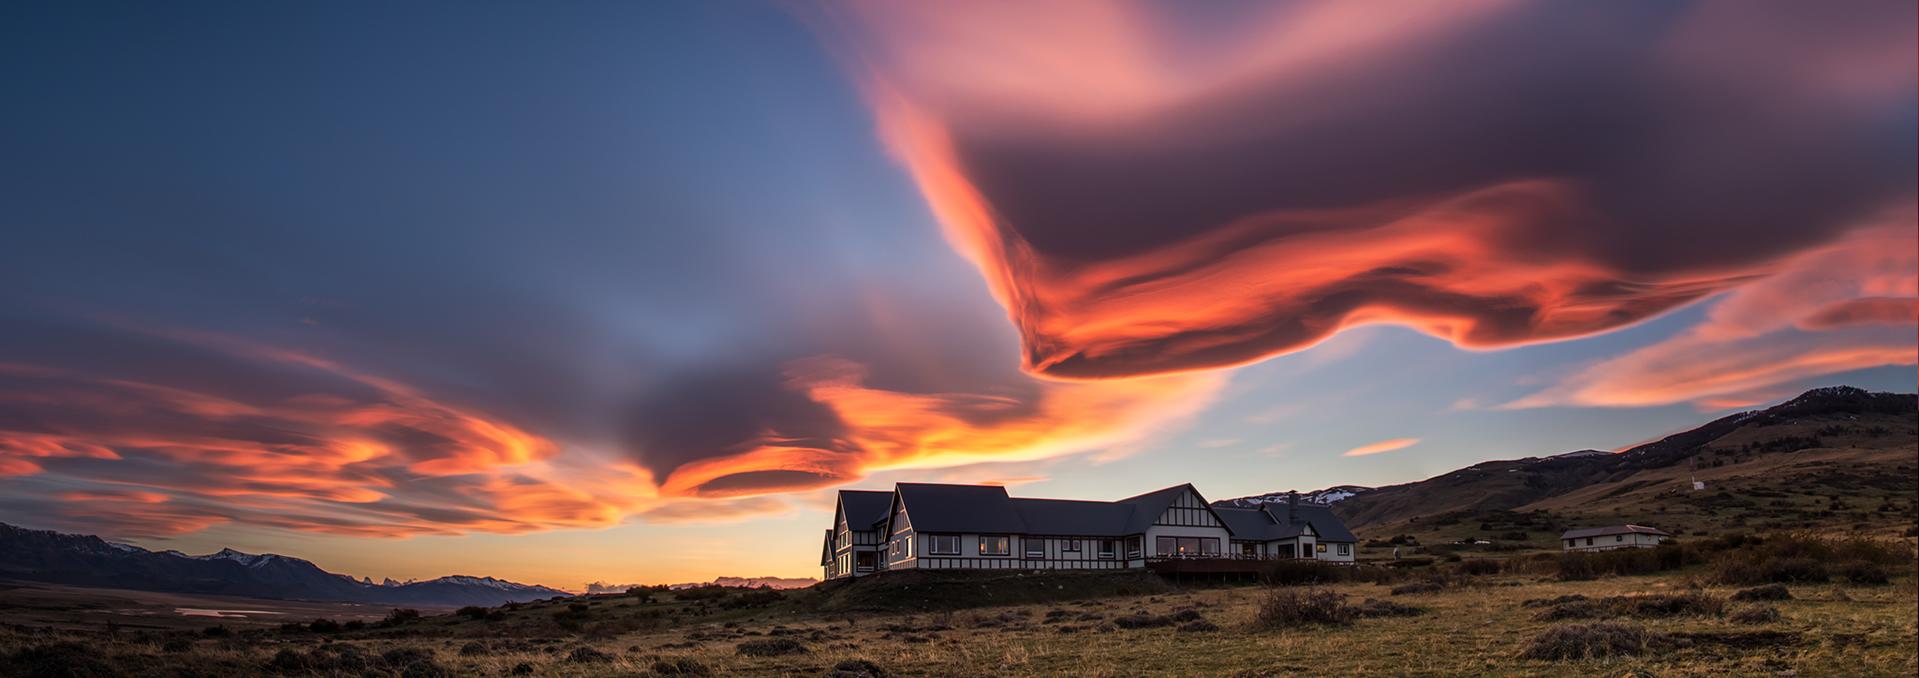 Top 10 der besten Hotels in Patagonien